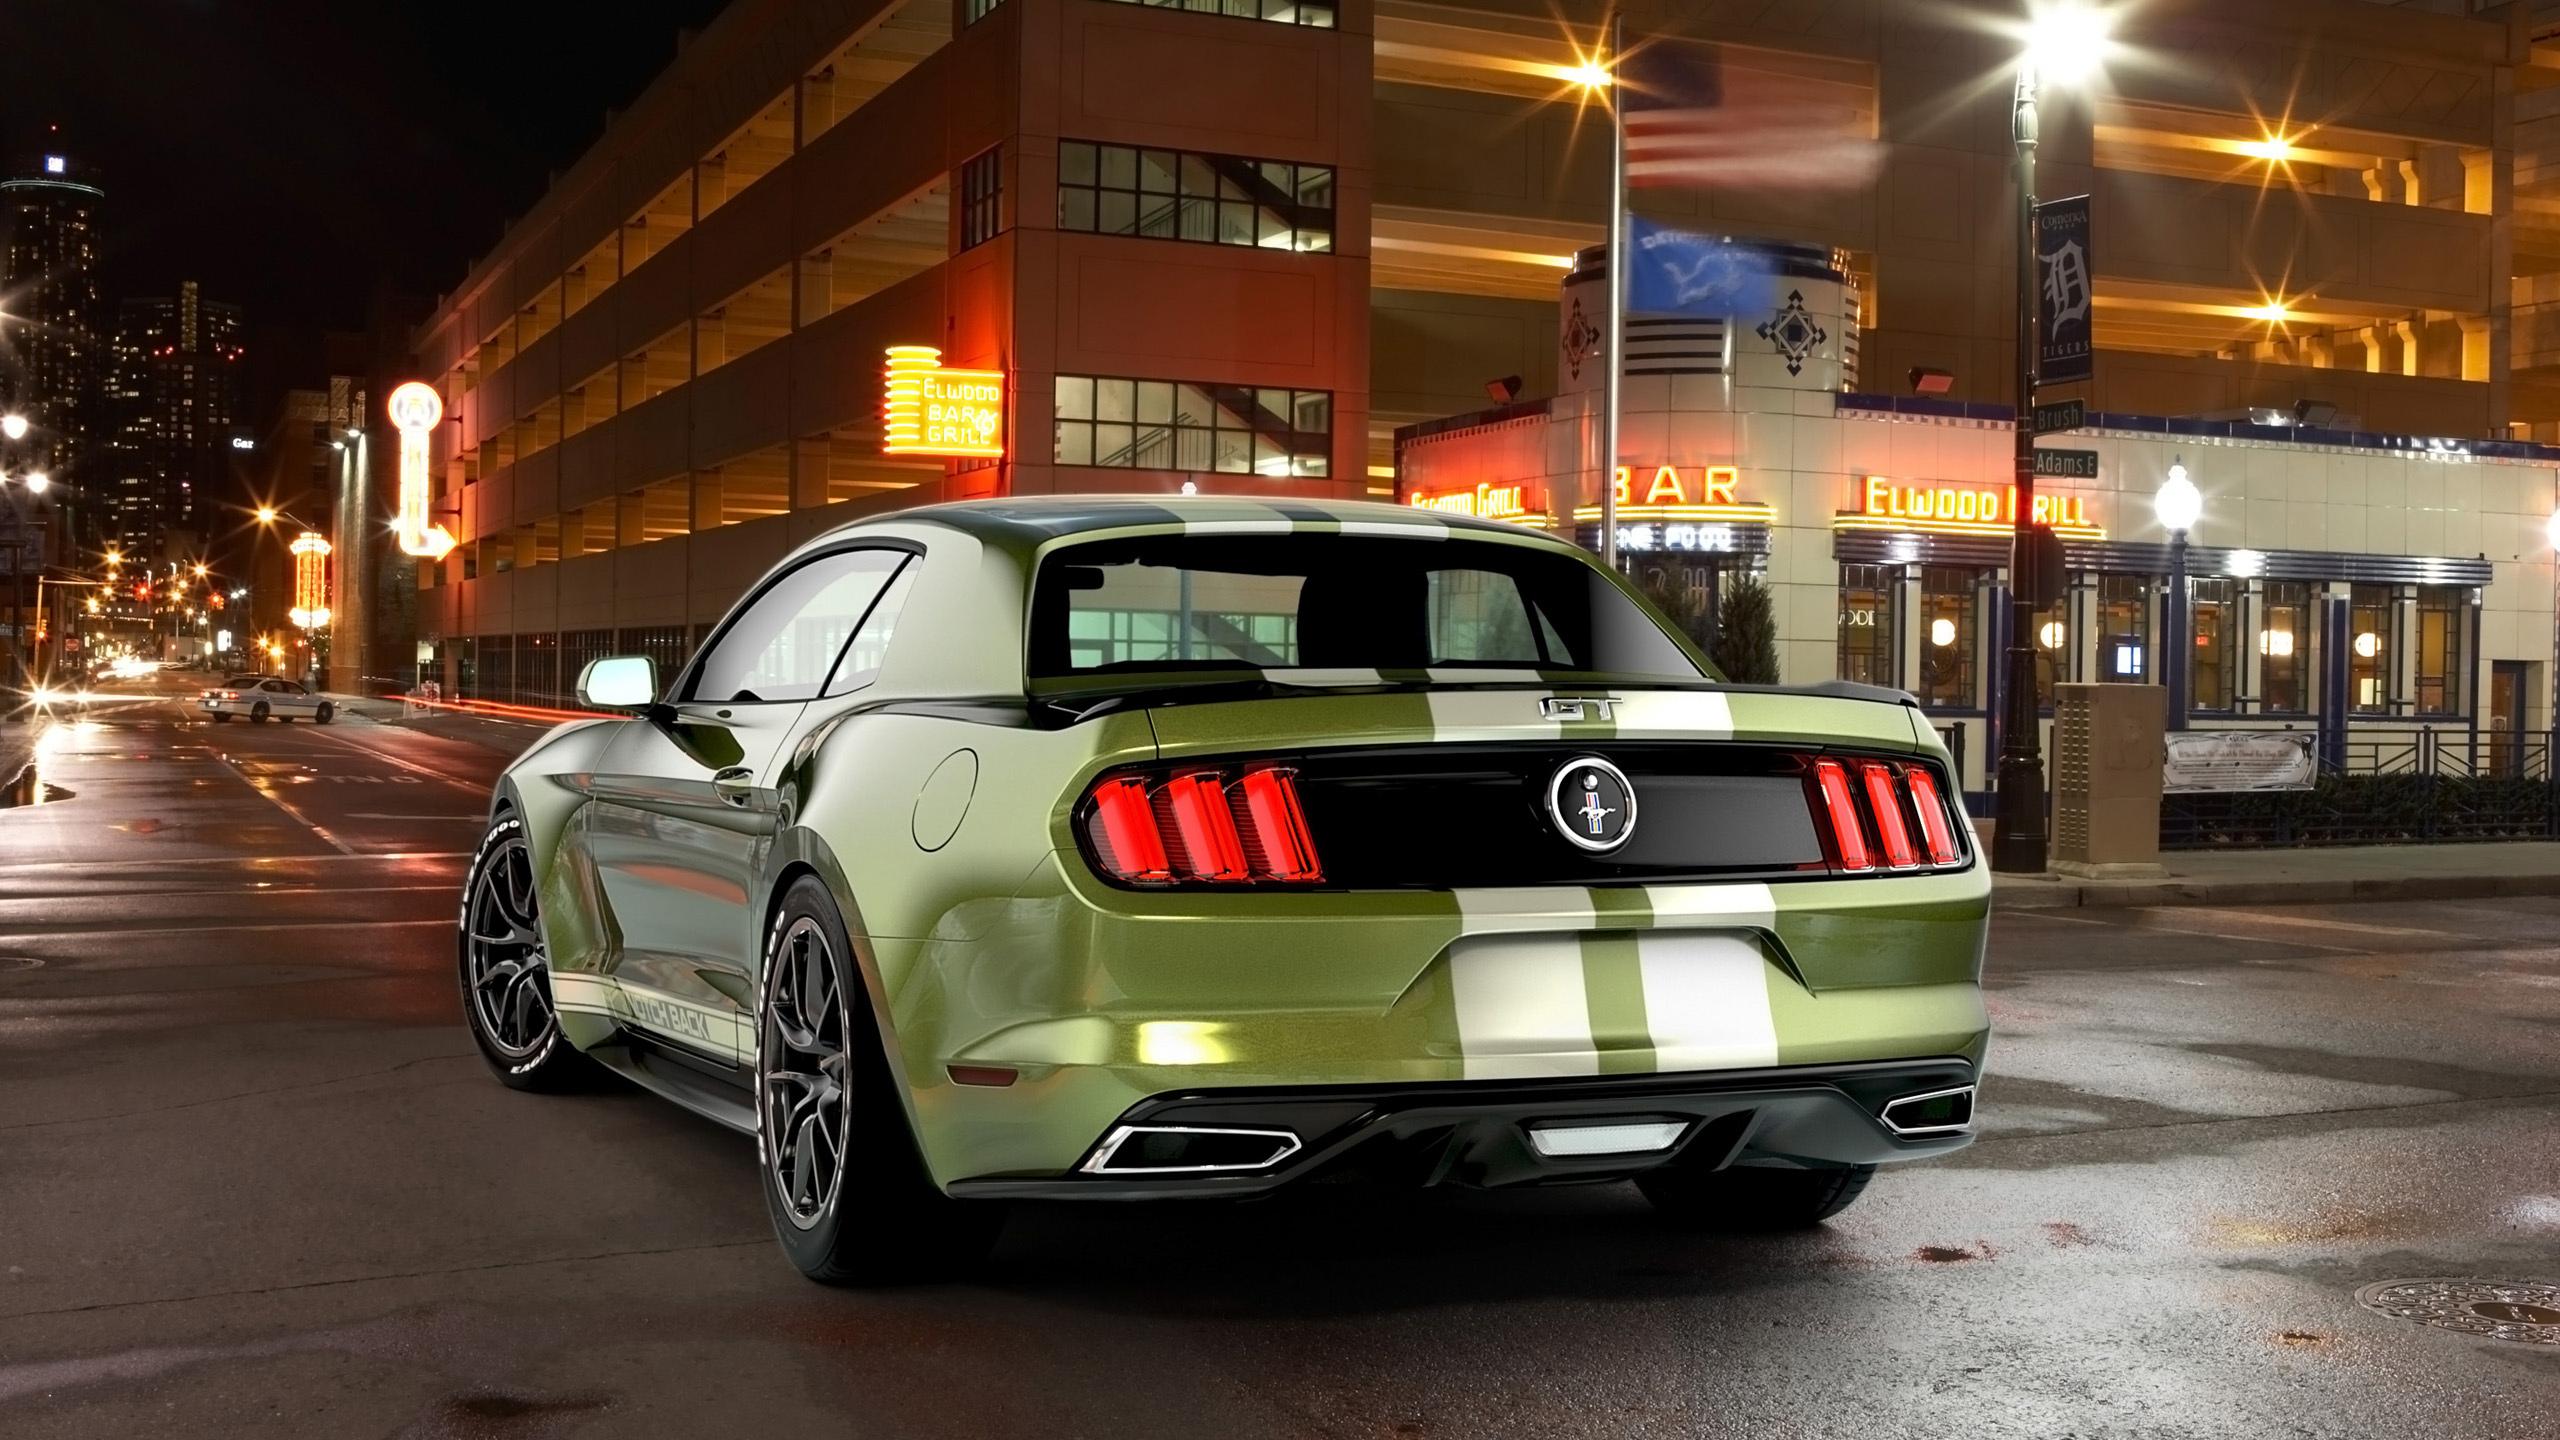 2017 Ford Mustang Notchback Design 2 Wallpaper Hd Car